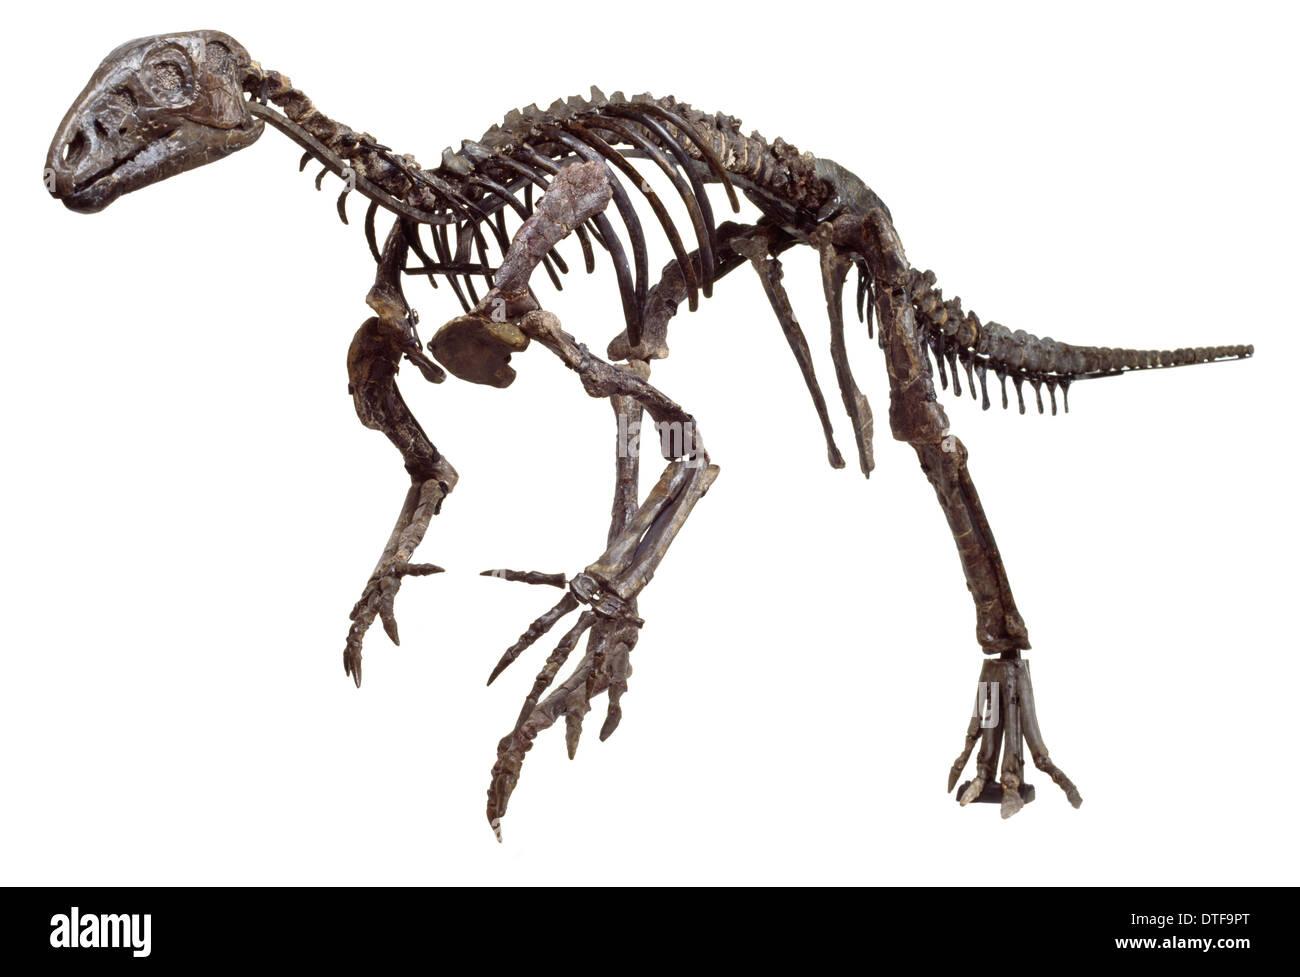 Hypsilophodon skeleton - Stock Image